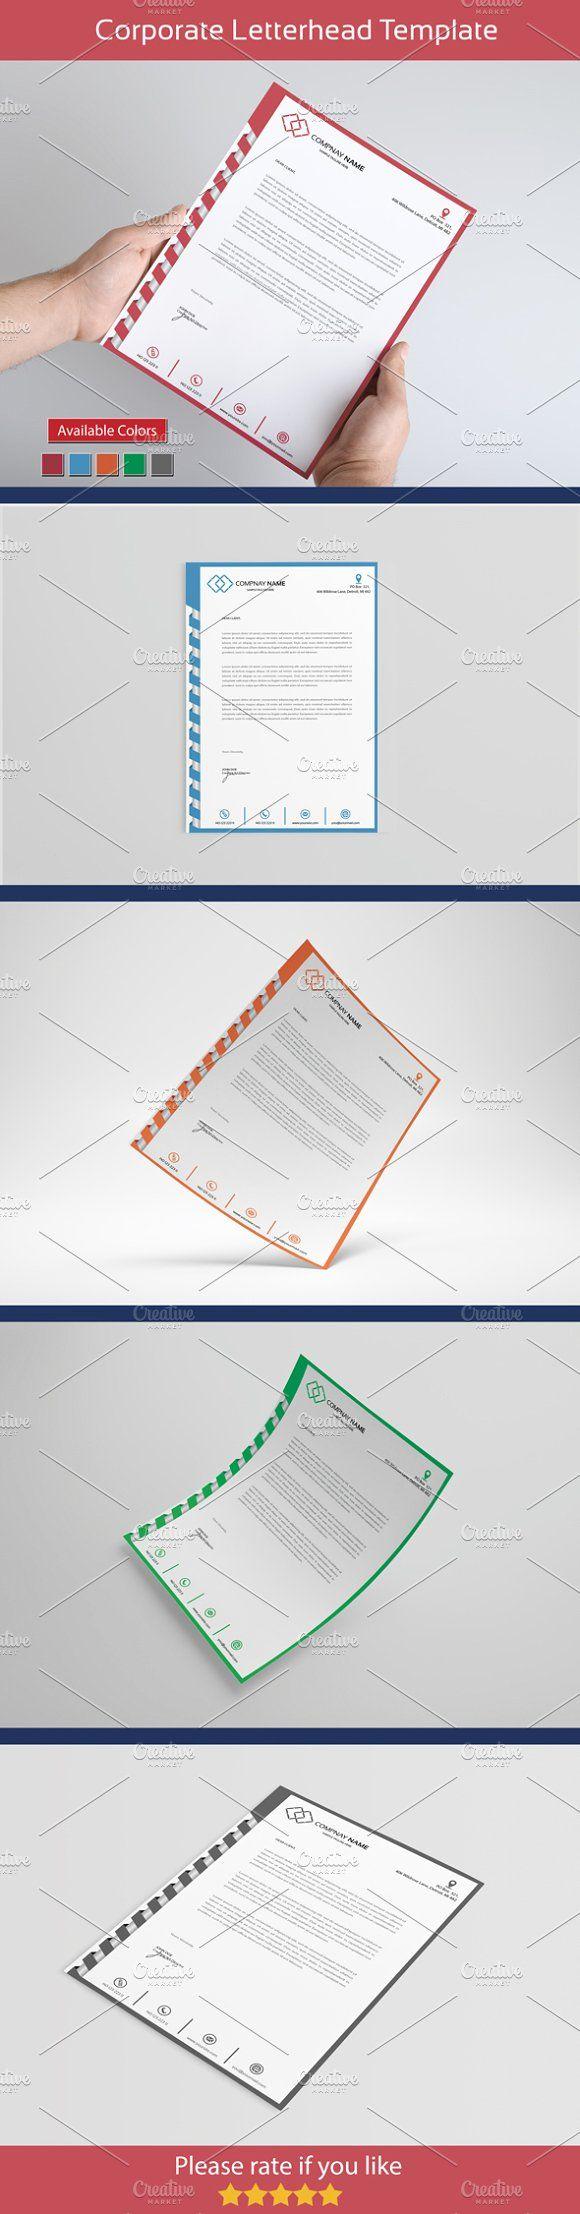 letter format on letterhead%0A Corporate Letter Head